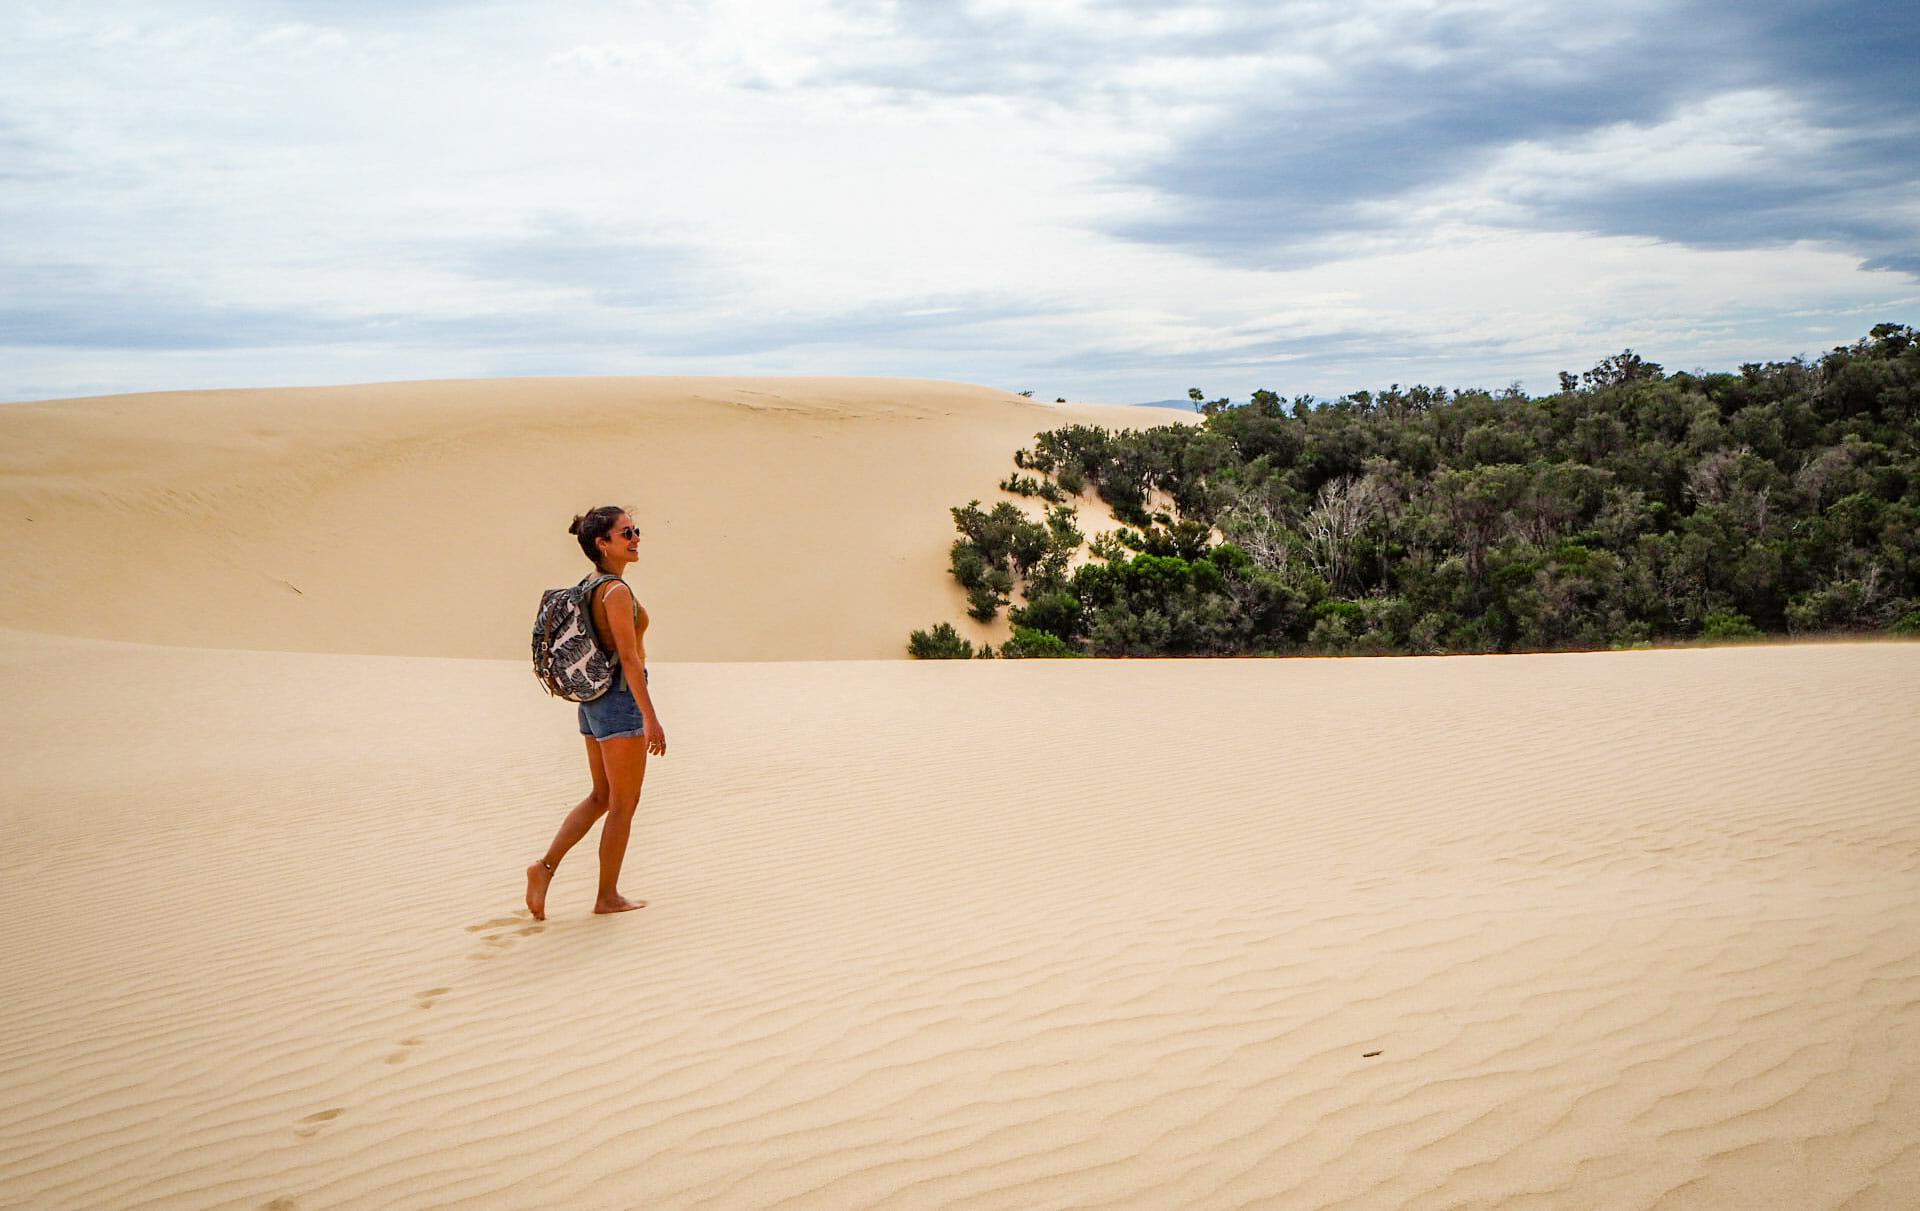 randonnee big drift dunes sable